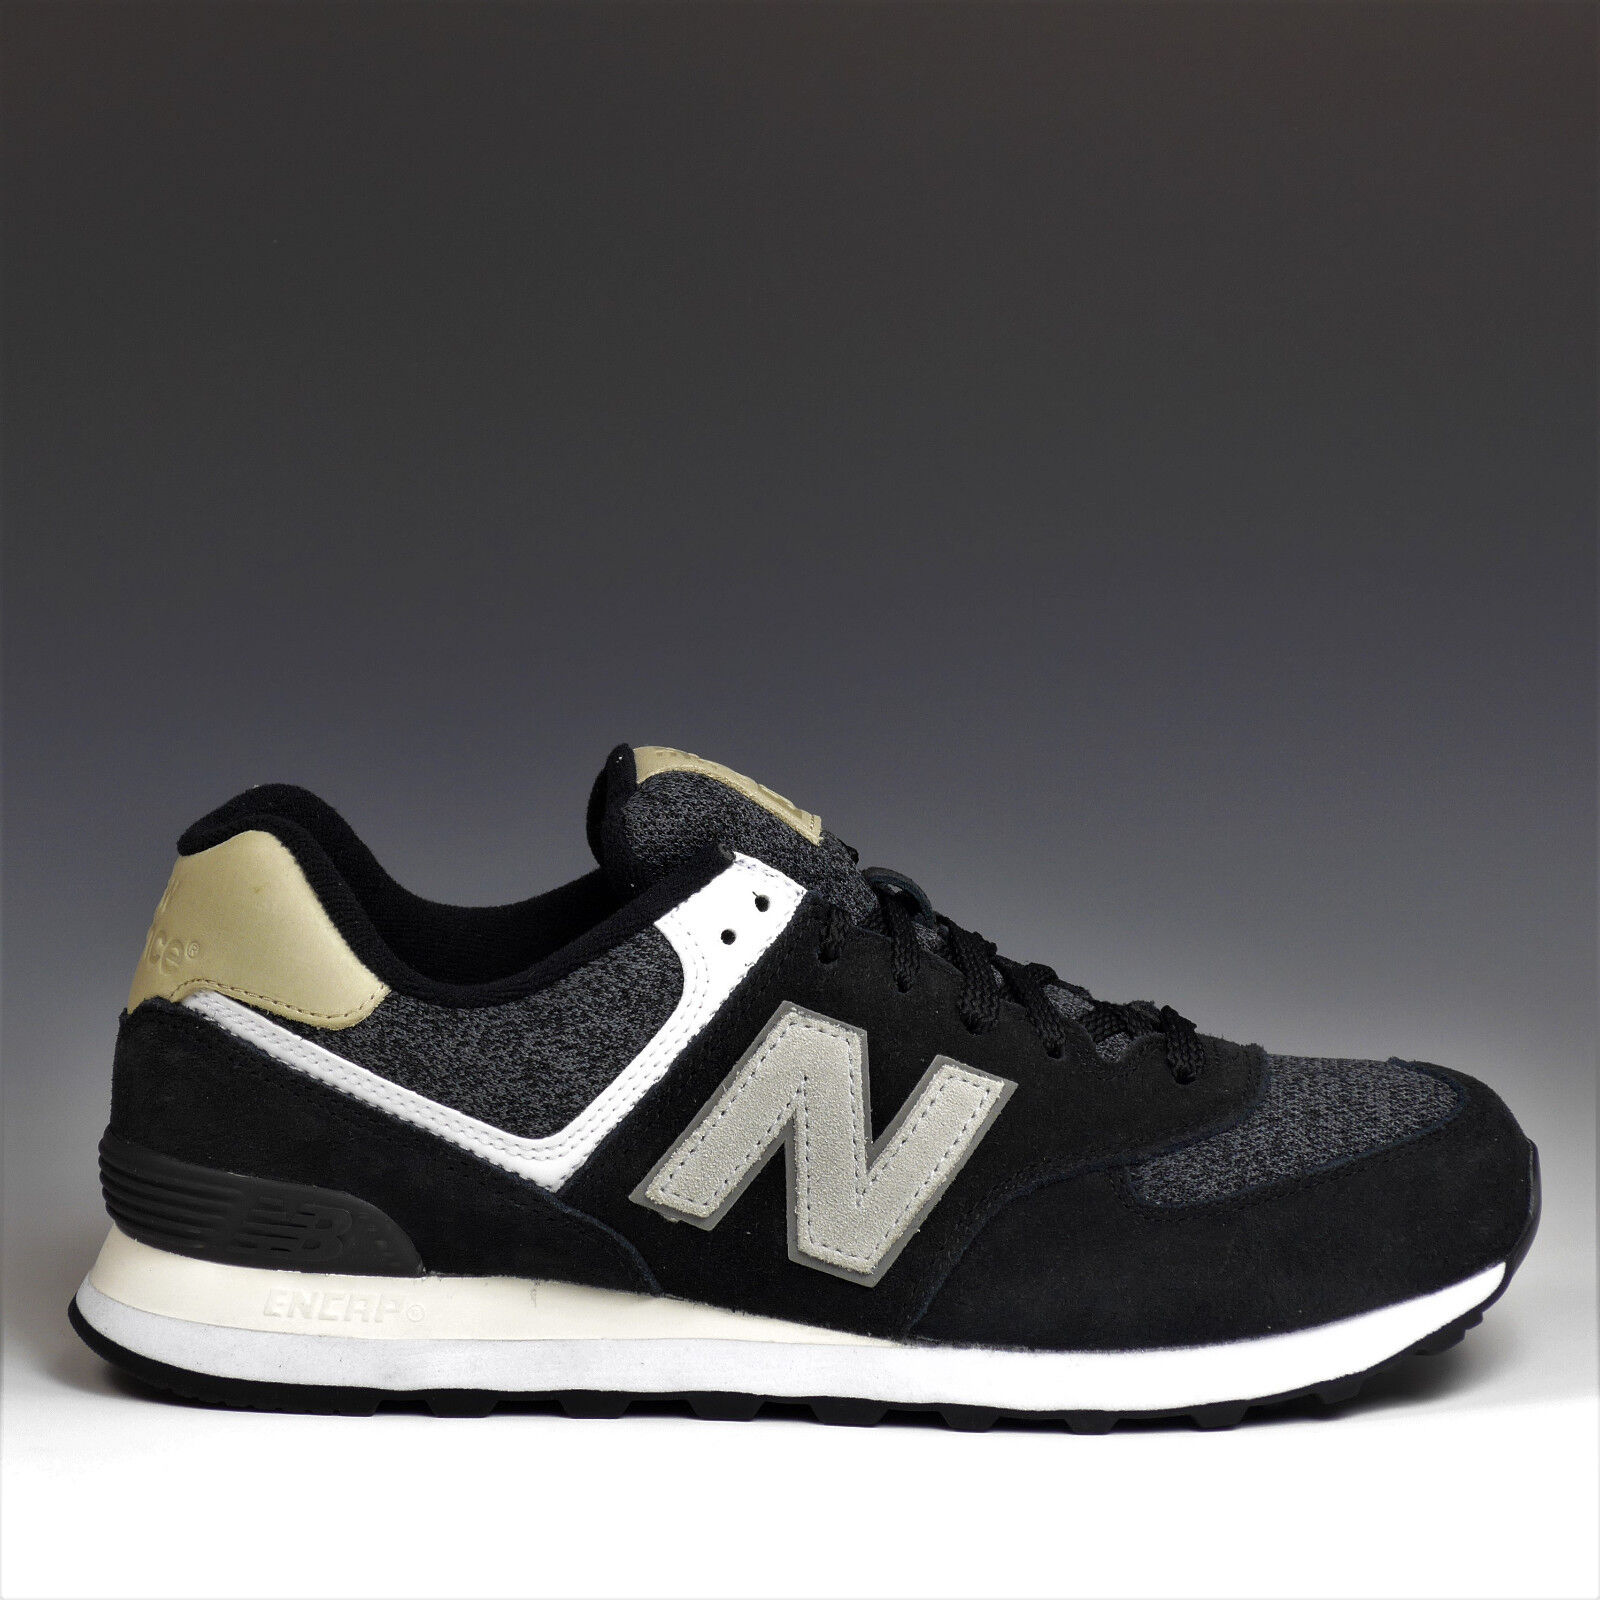 New Balance ML574 Leder Sneaker ML574VAI Herren Schuhe Laufschuhe NEU